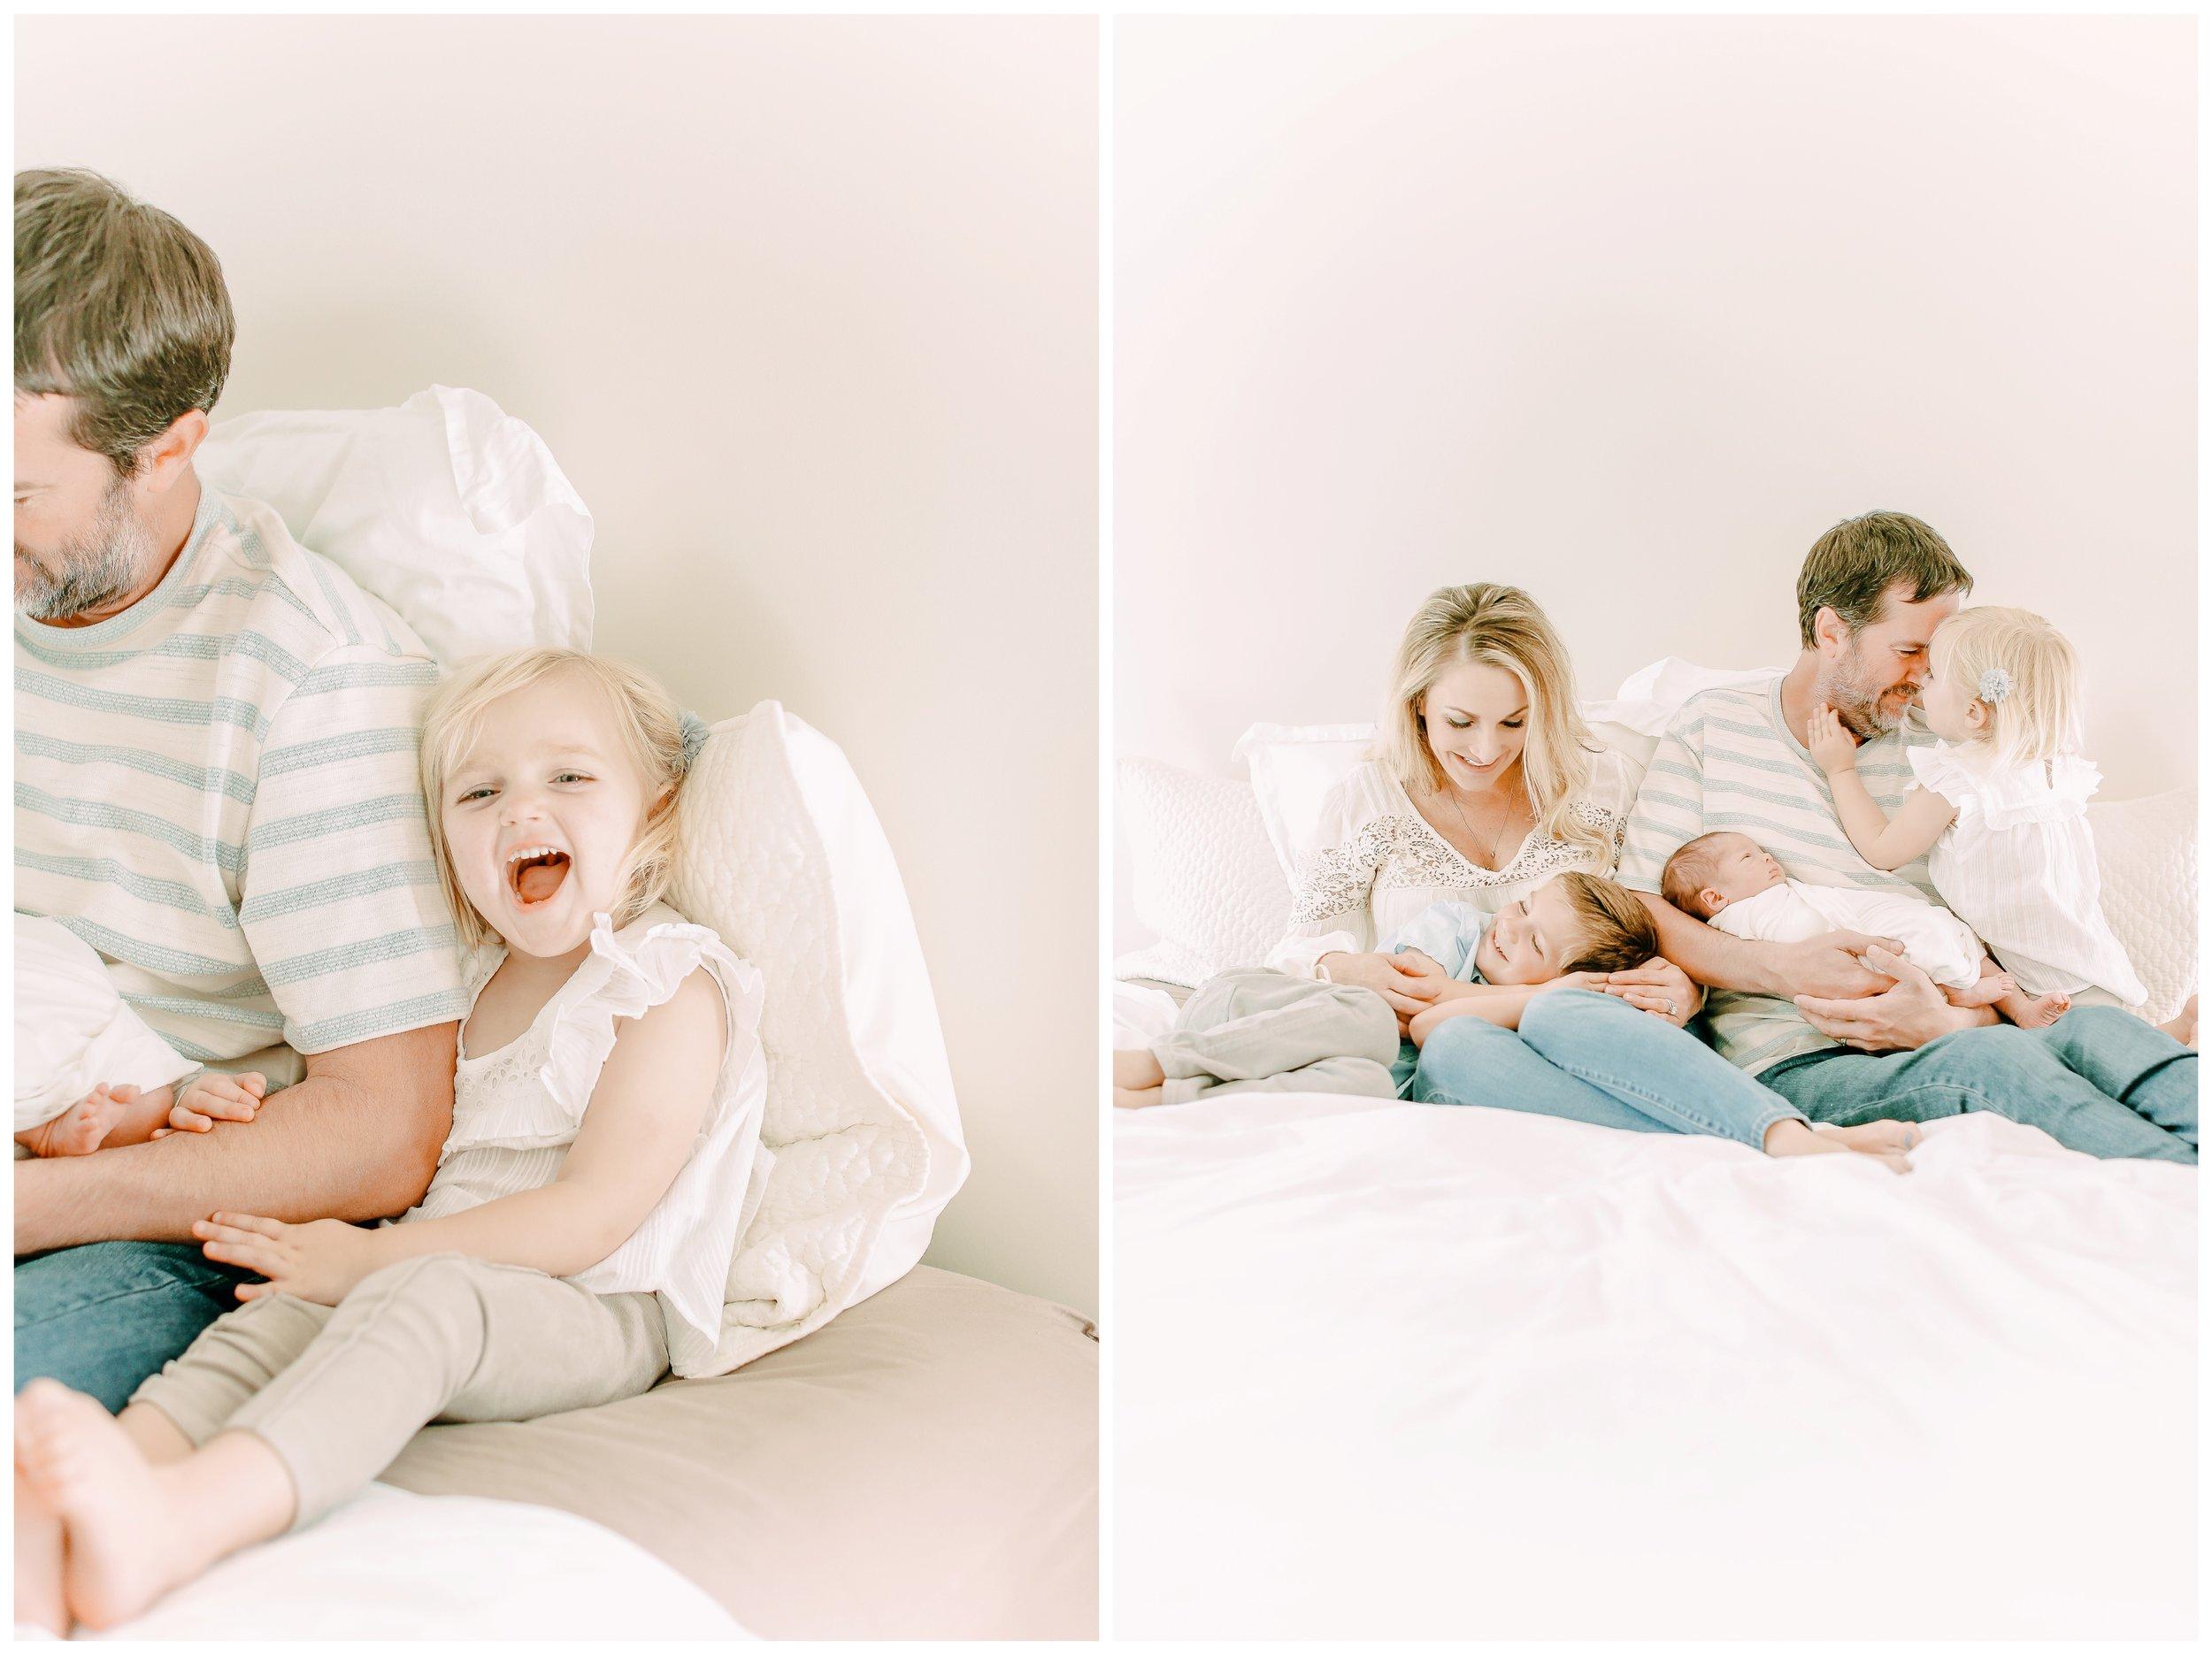 Family-Session_in-home-Orange_county_family_and_newborn-photographer_cori_kleckner_photography_Newport_beach_family_photographer__0818.jpg